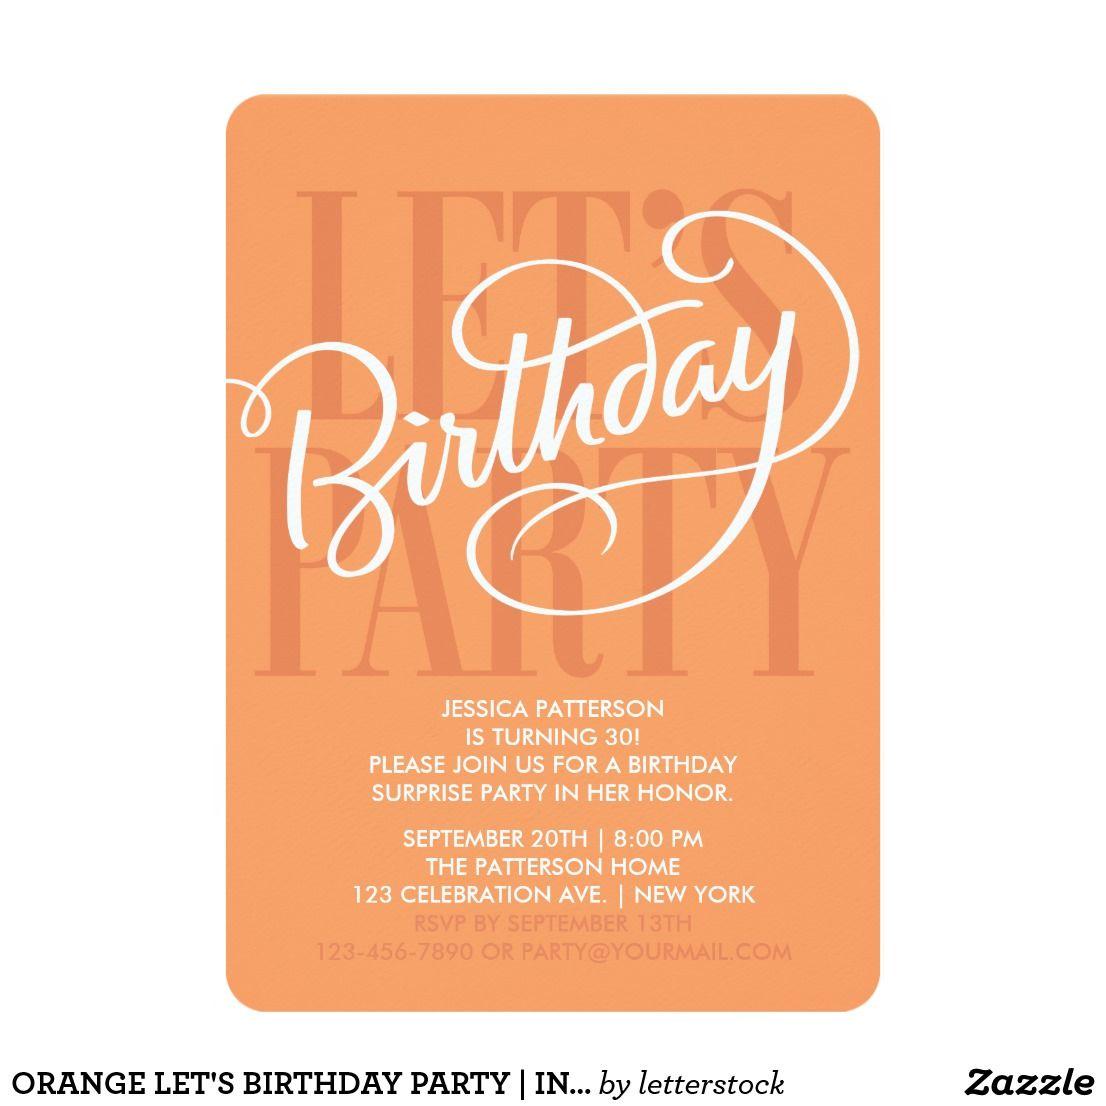 Orange lets birthday party invitation birthday original custom orange lets birthday party invitation birthday original custom hand lettering by letterstock stopboris Image collections